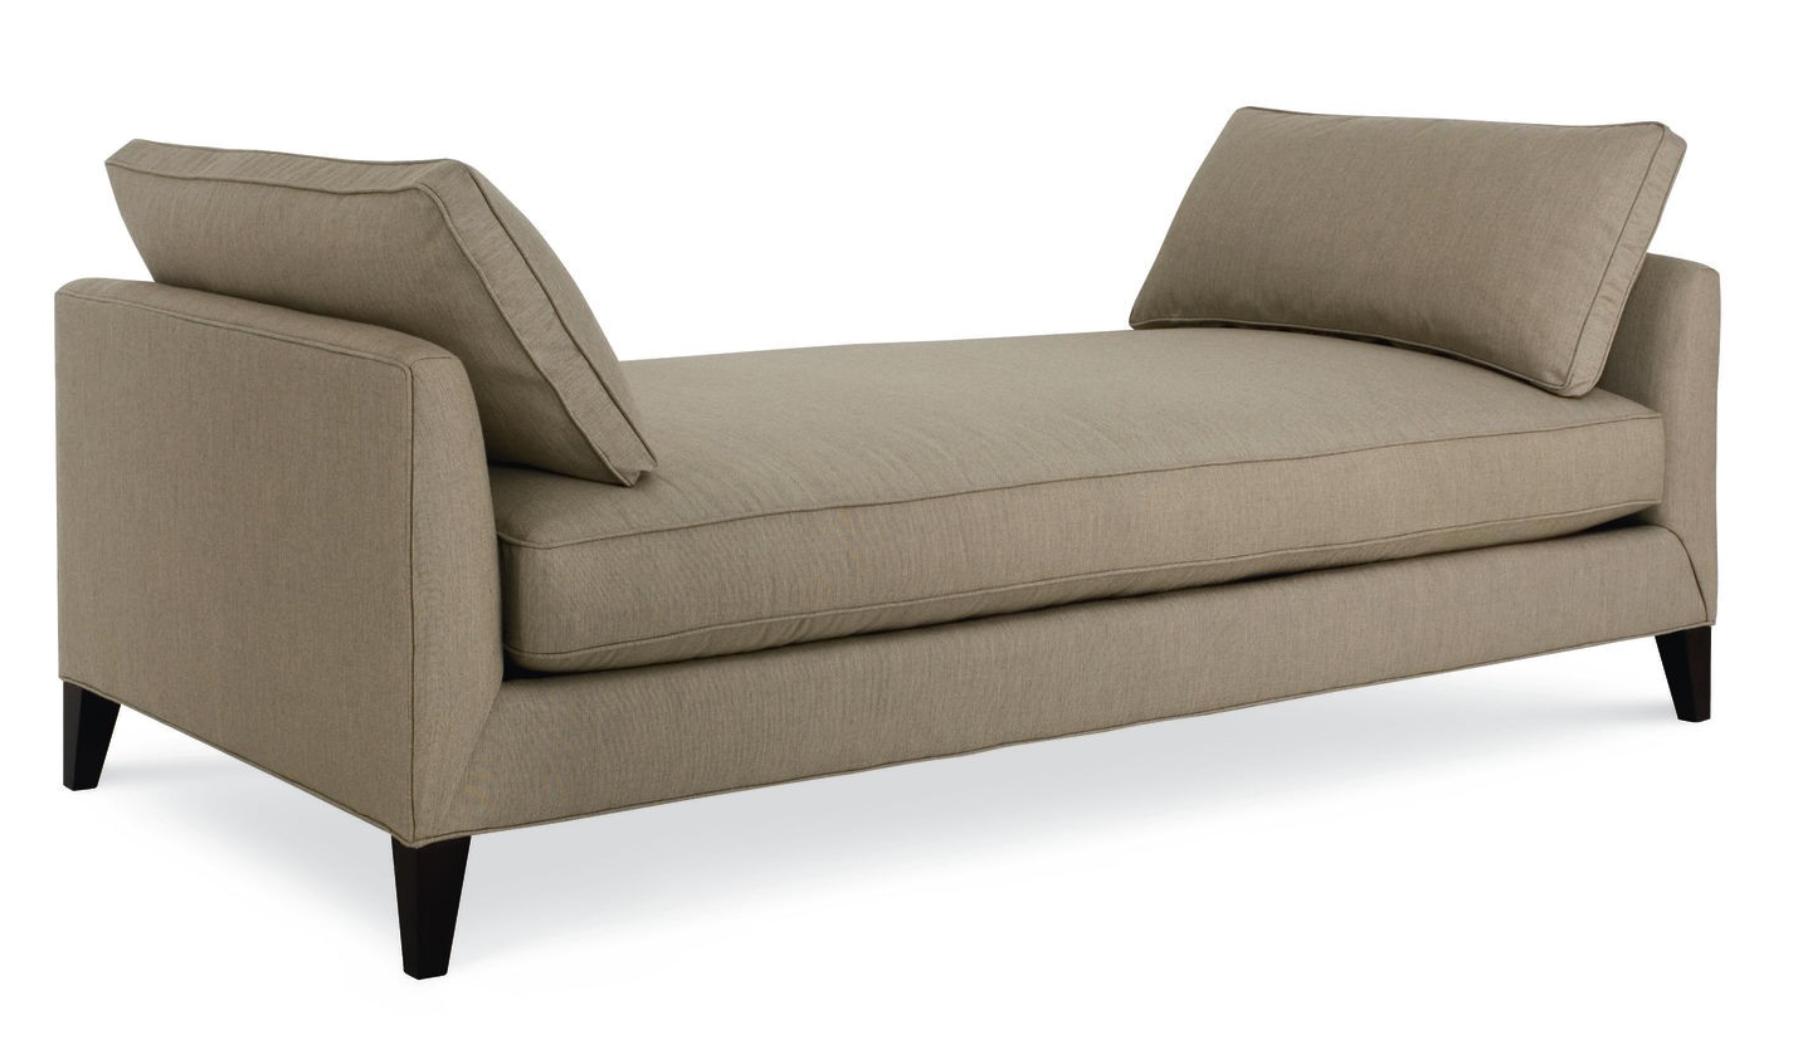 friday family friendly find cr laine liv daybed. Black Bedroom Furniture Sets. Home Design Ideas